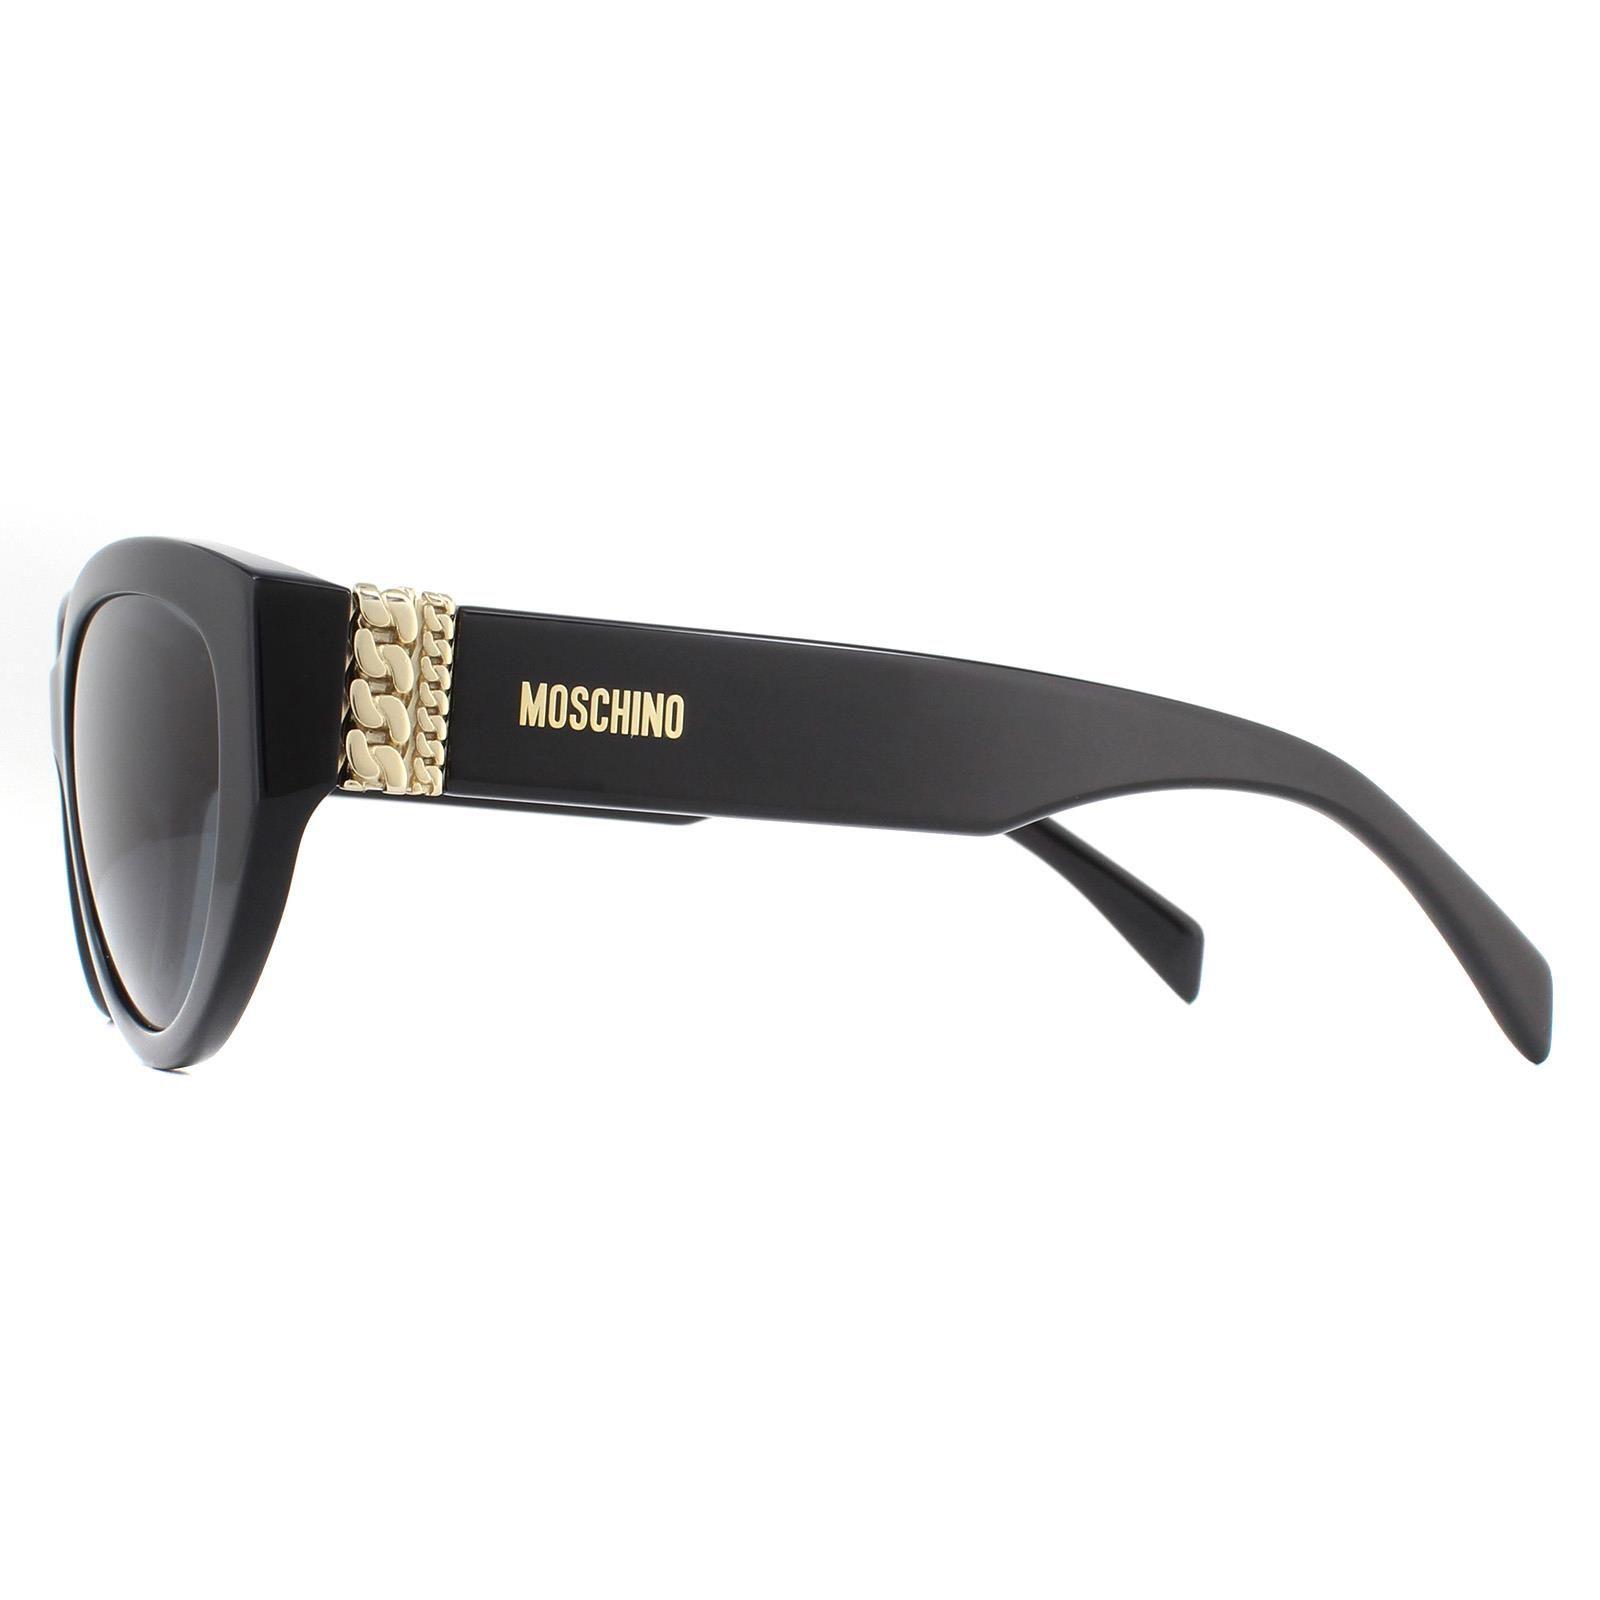 Moschino Sunglasses MOS012/S 807 IR Black Grey Gradient Polarized